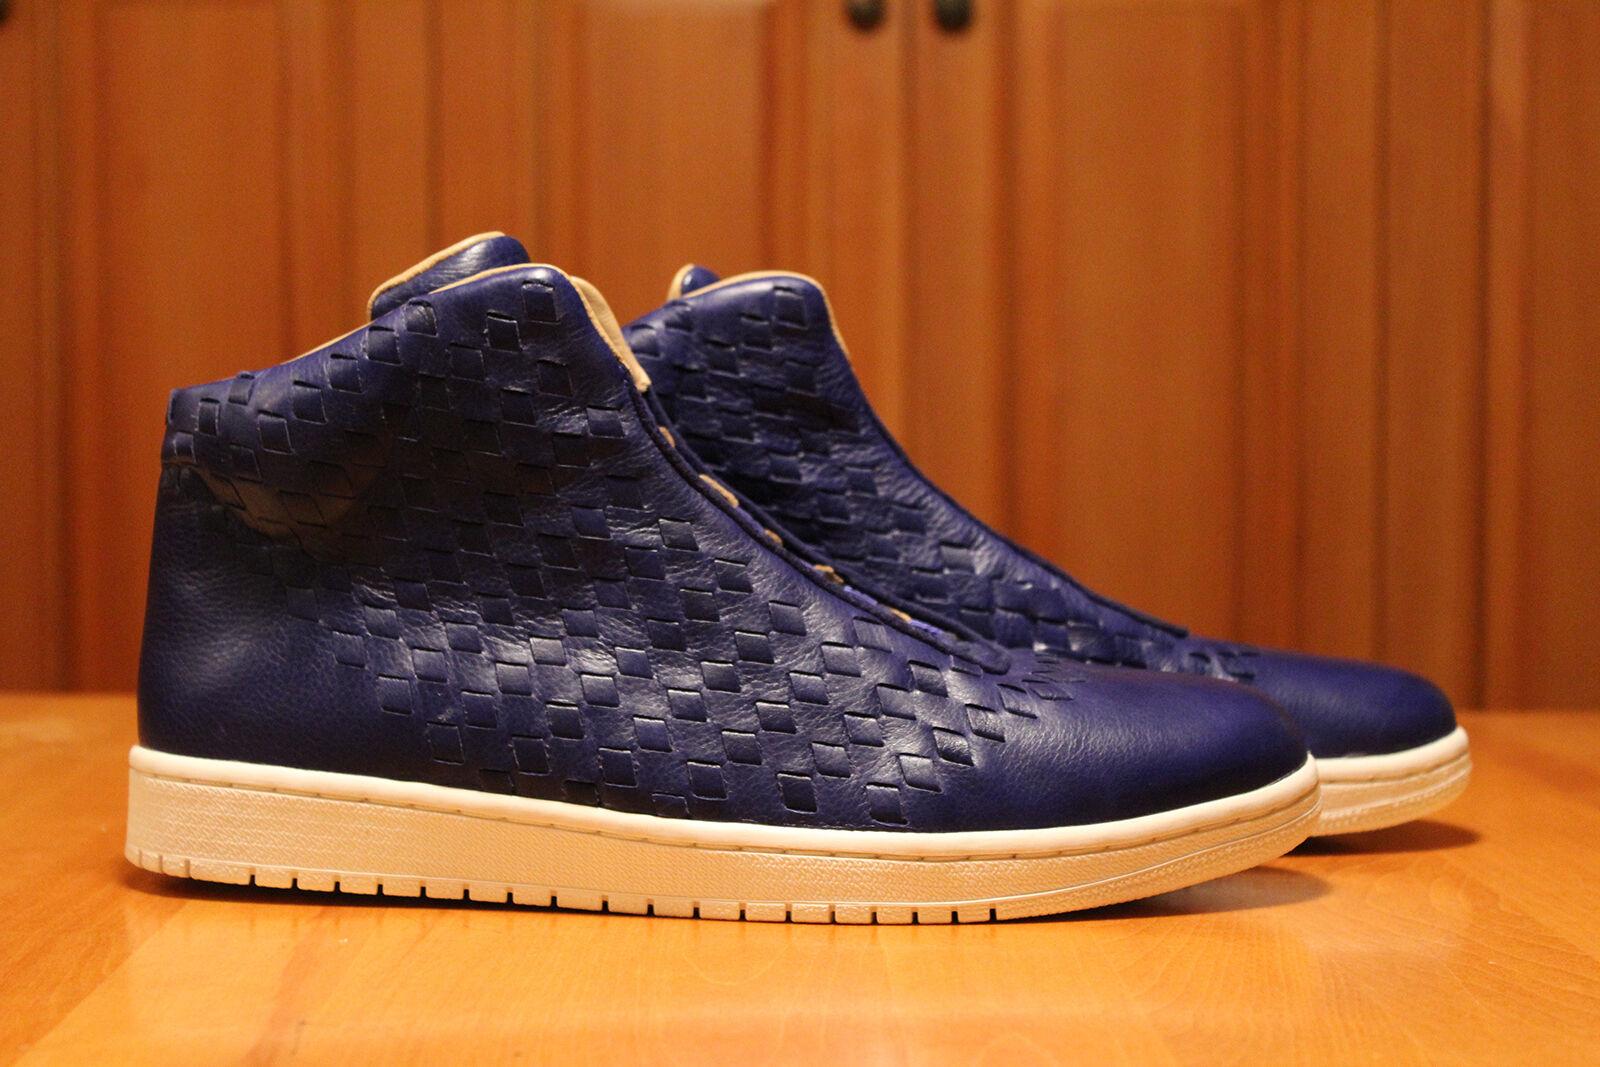 Air Jordan Shine bluee White rare 11.5 retro Athletic Sneakers